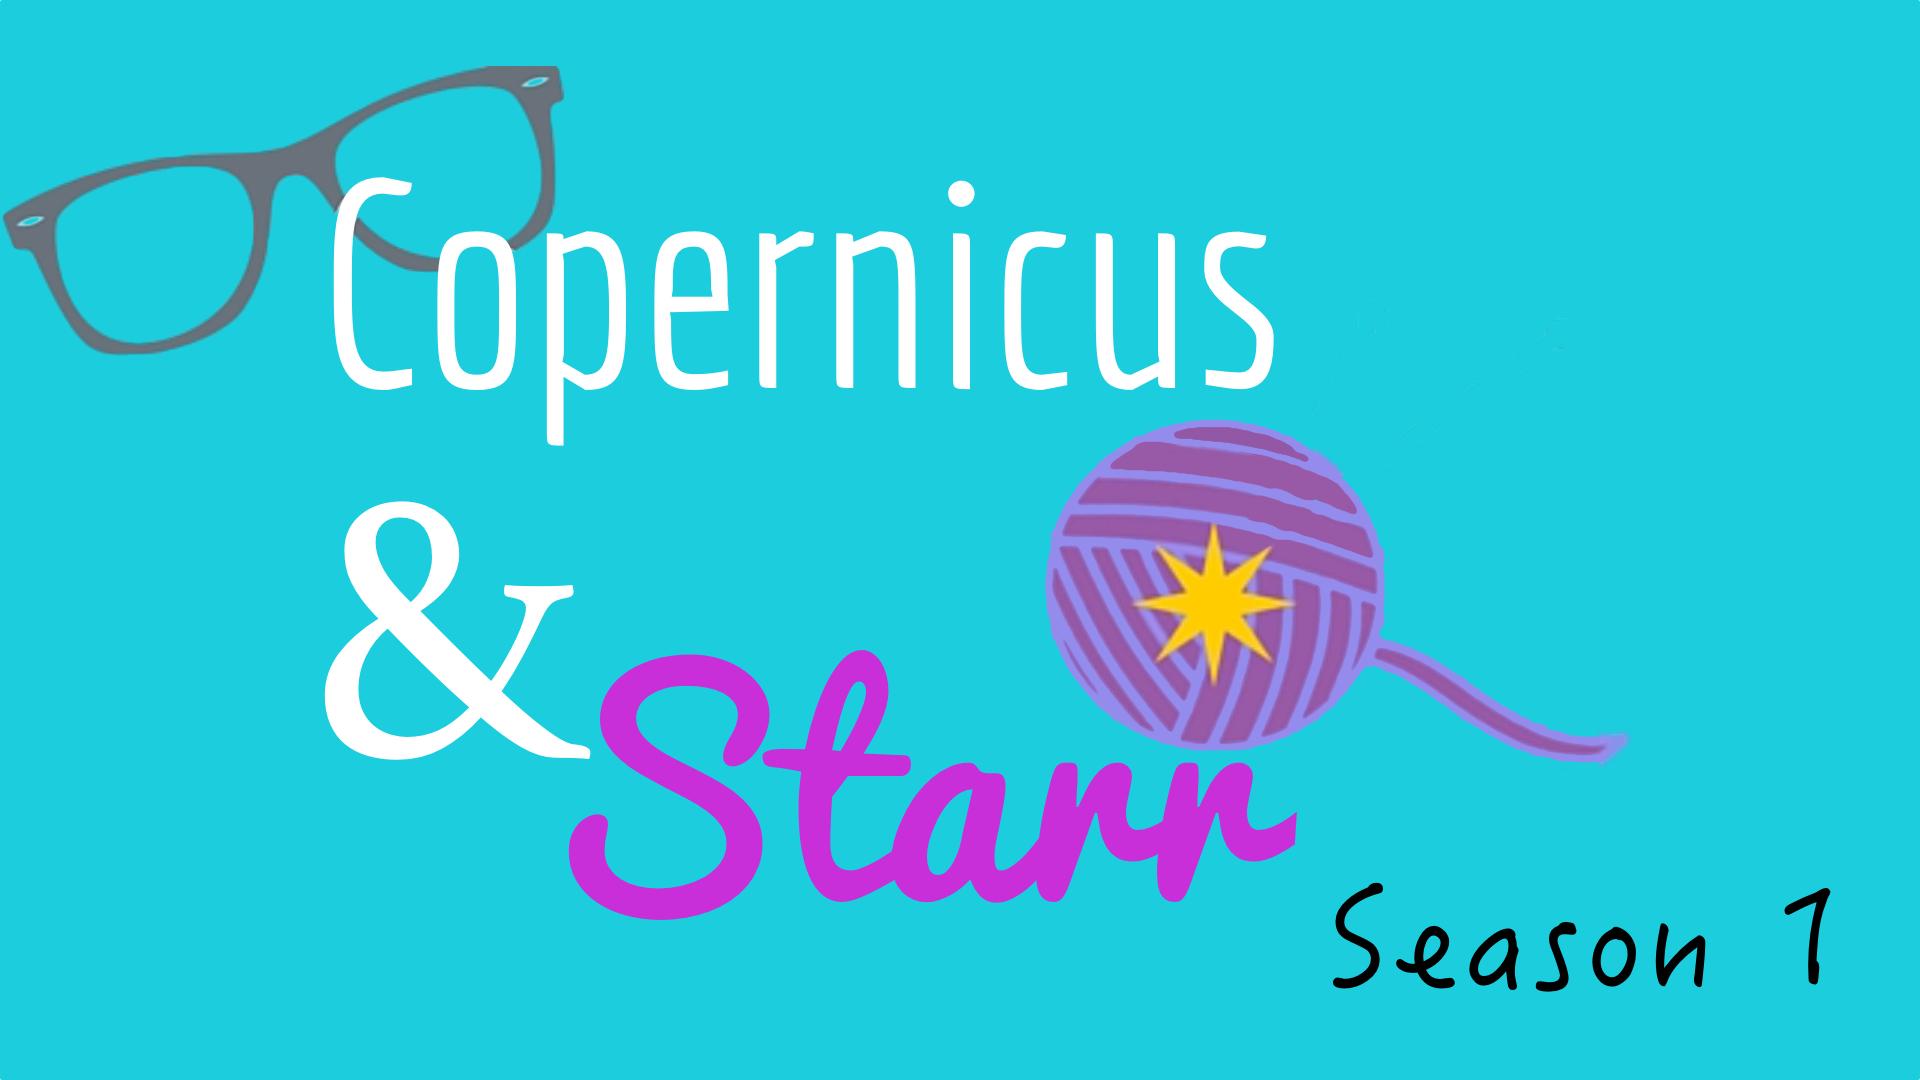 Copernicus and Starr Season 1 Card.jpg